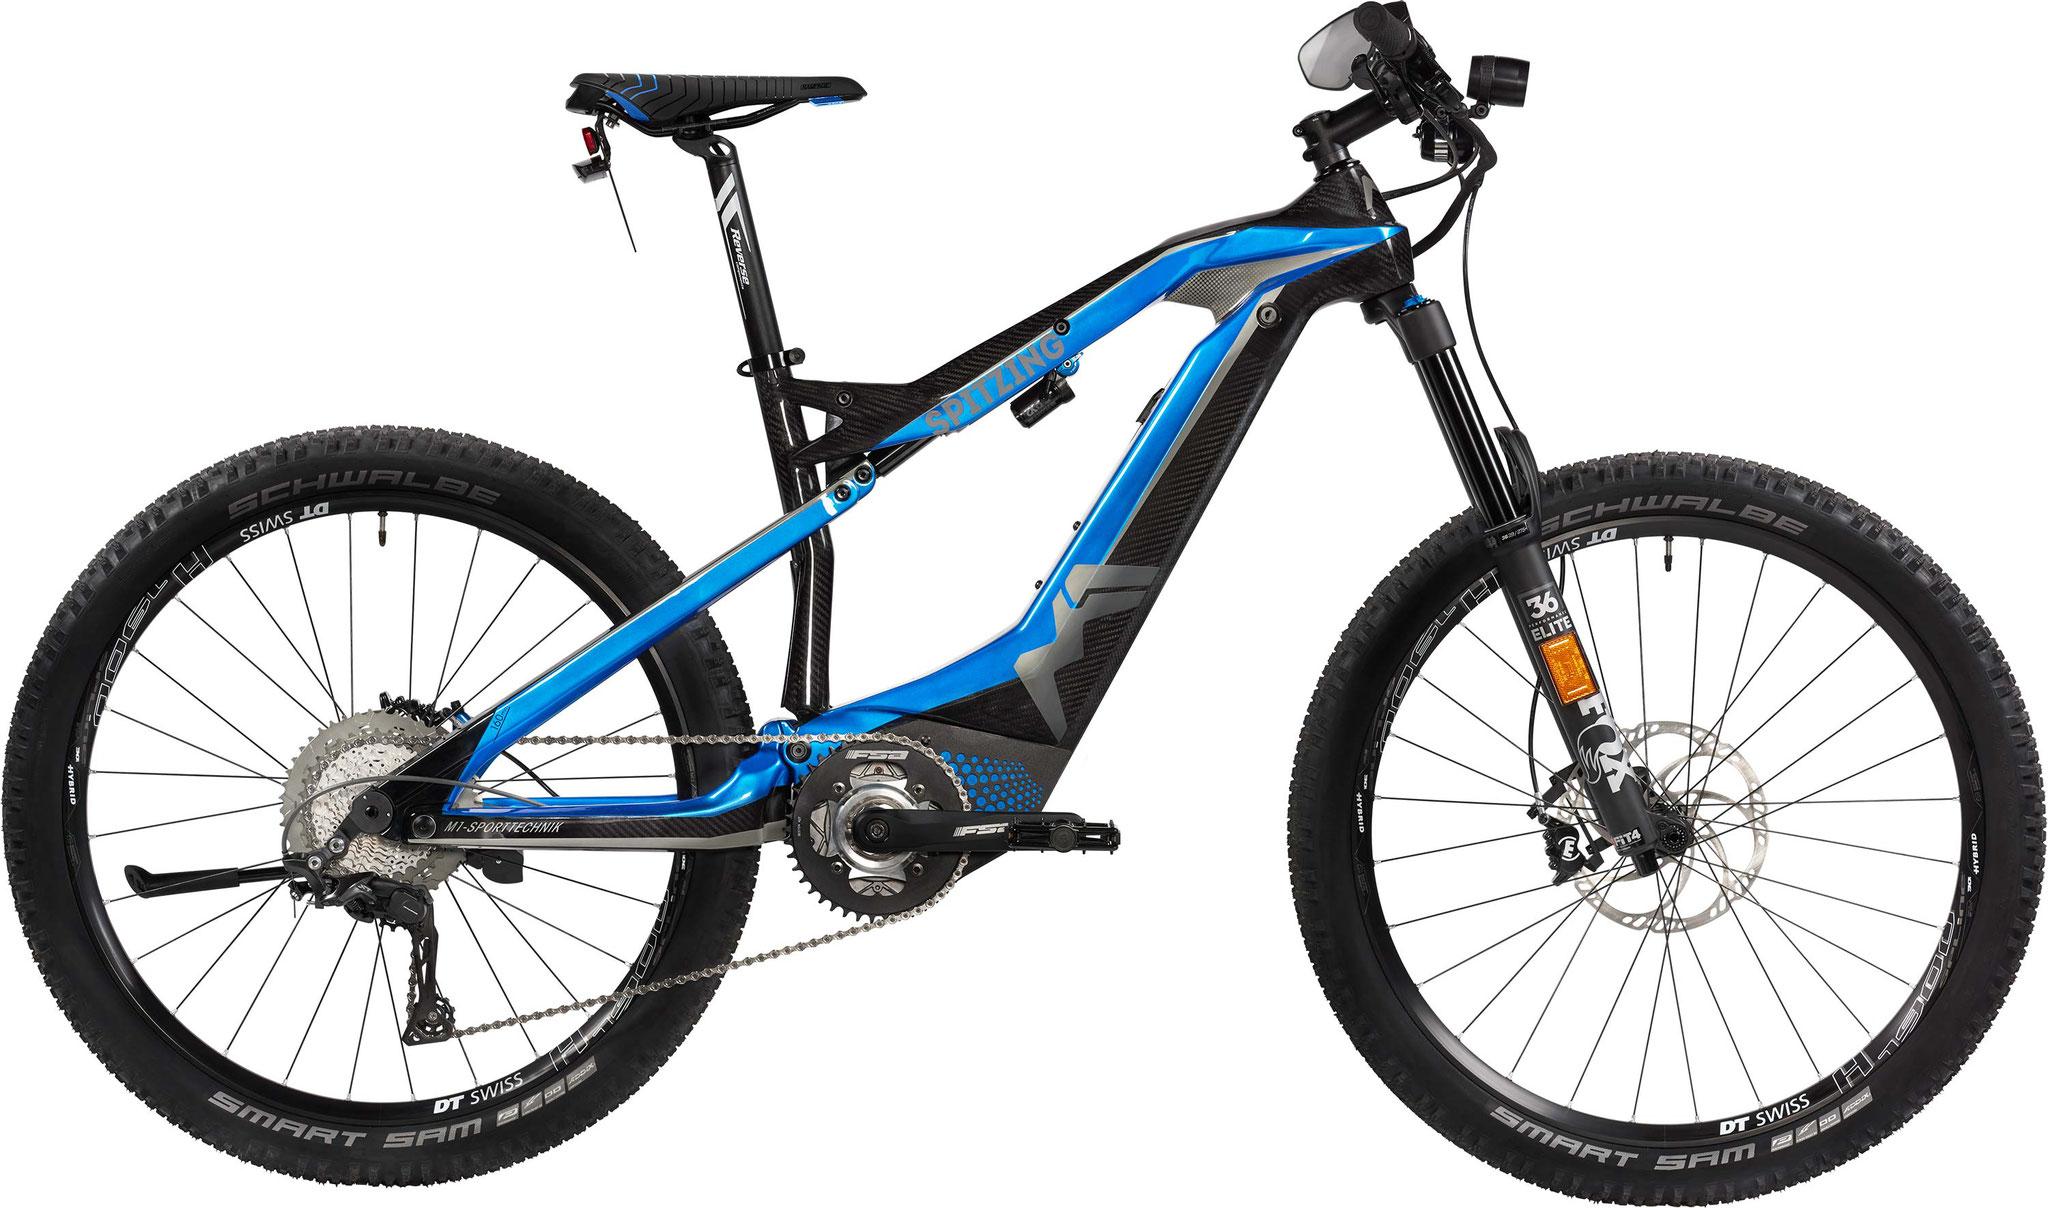 M1 Spitzing Evolution Pedelec 2020 - candy blue/carbon